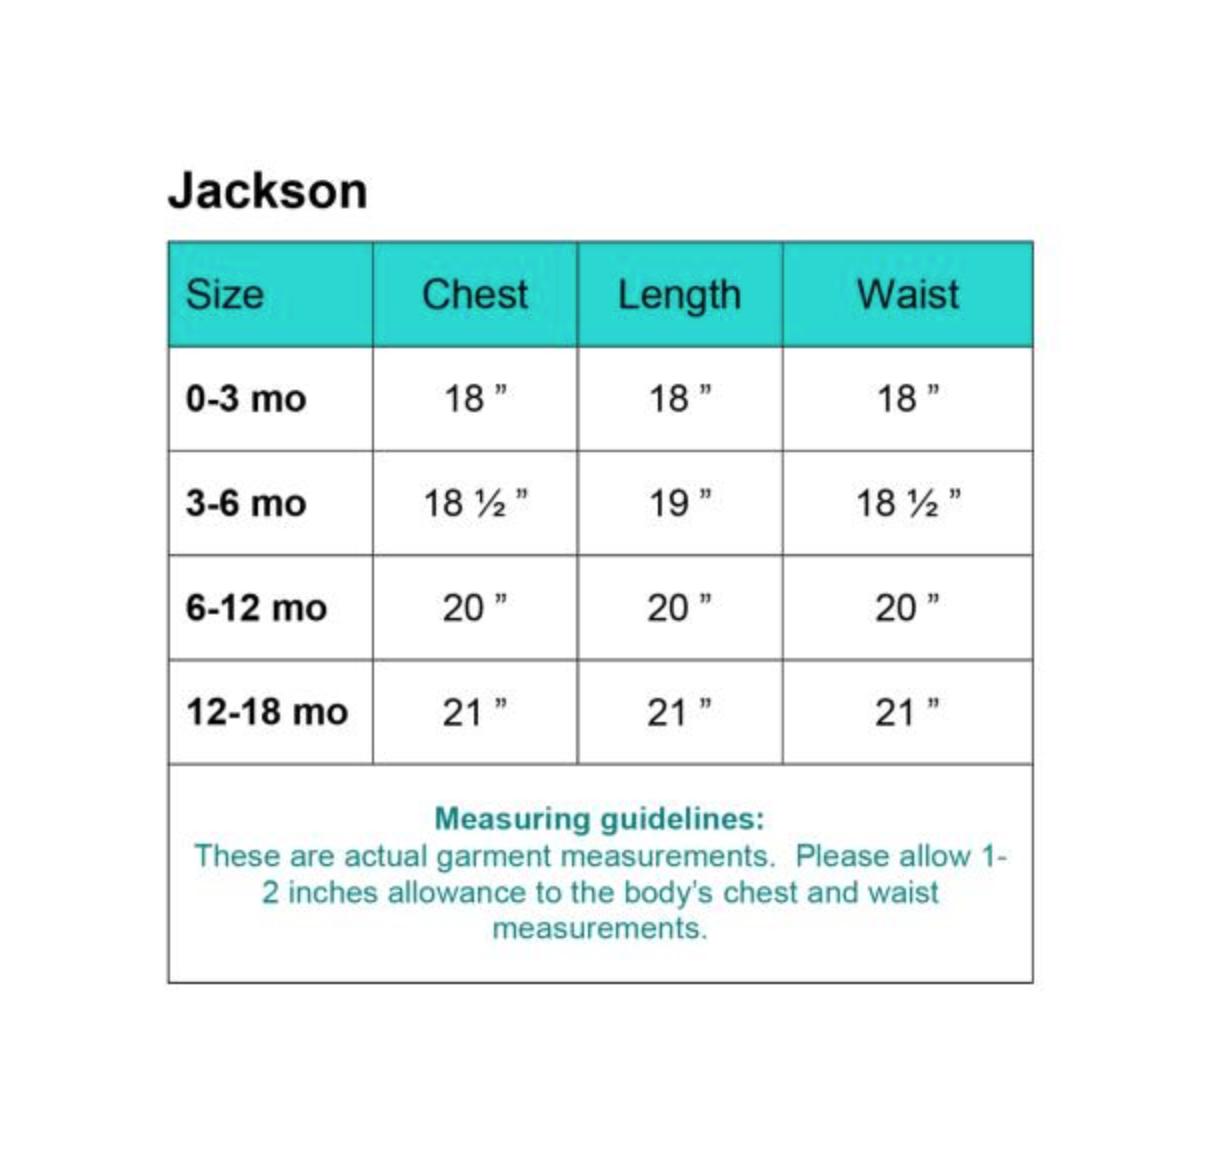 sizing-chart-jackson.png